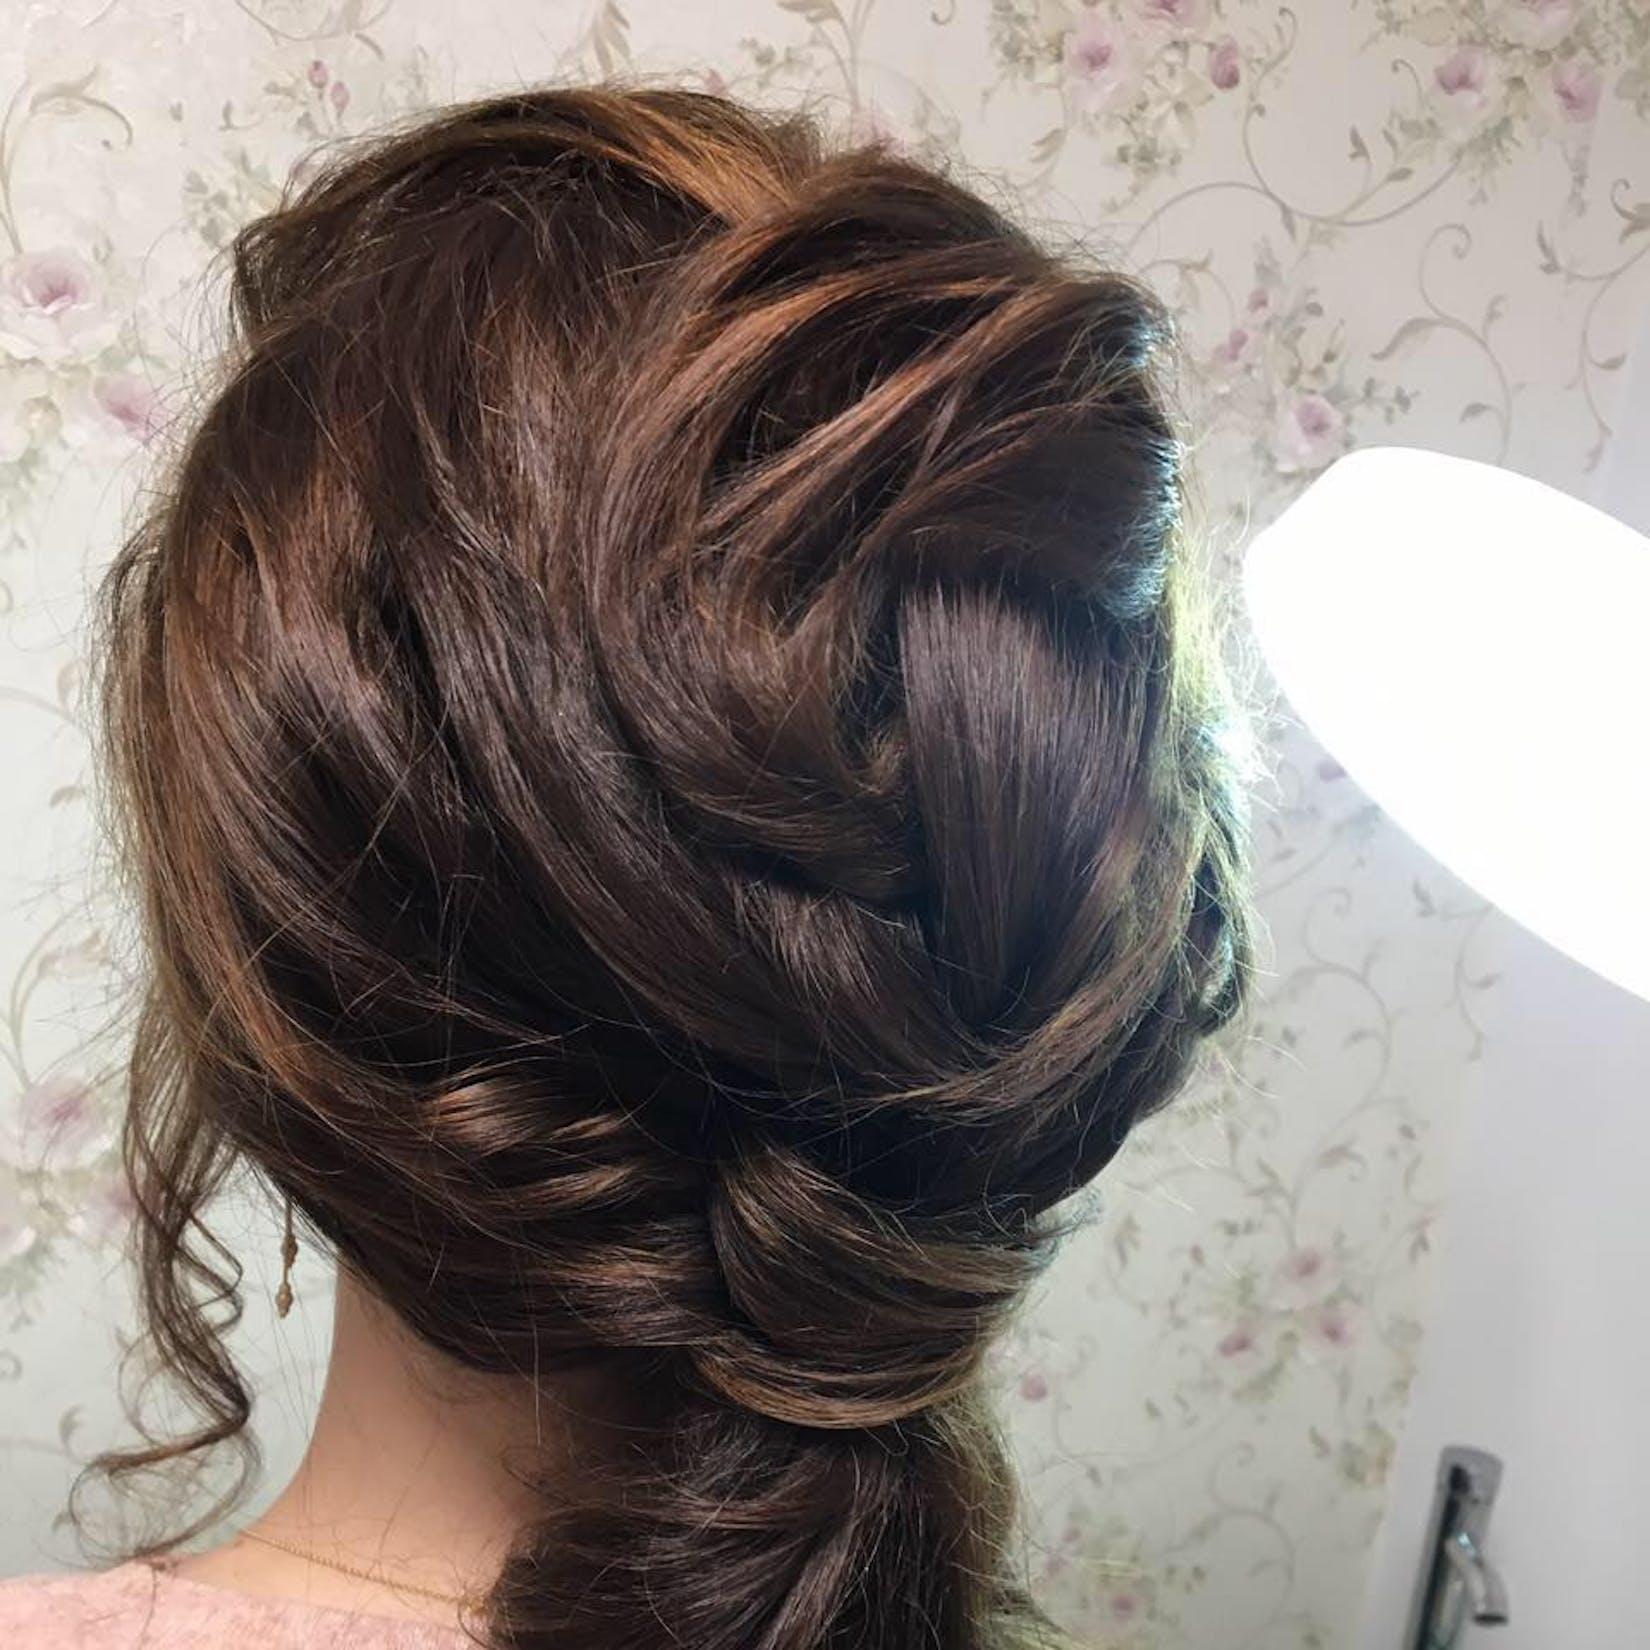 Chic Salon | Beauty